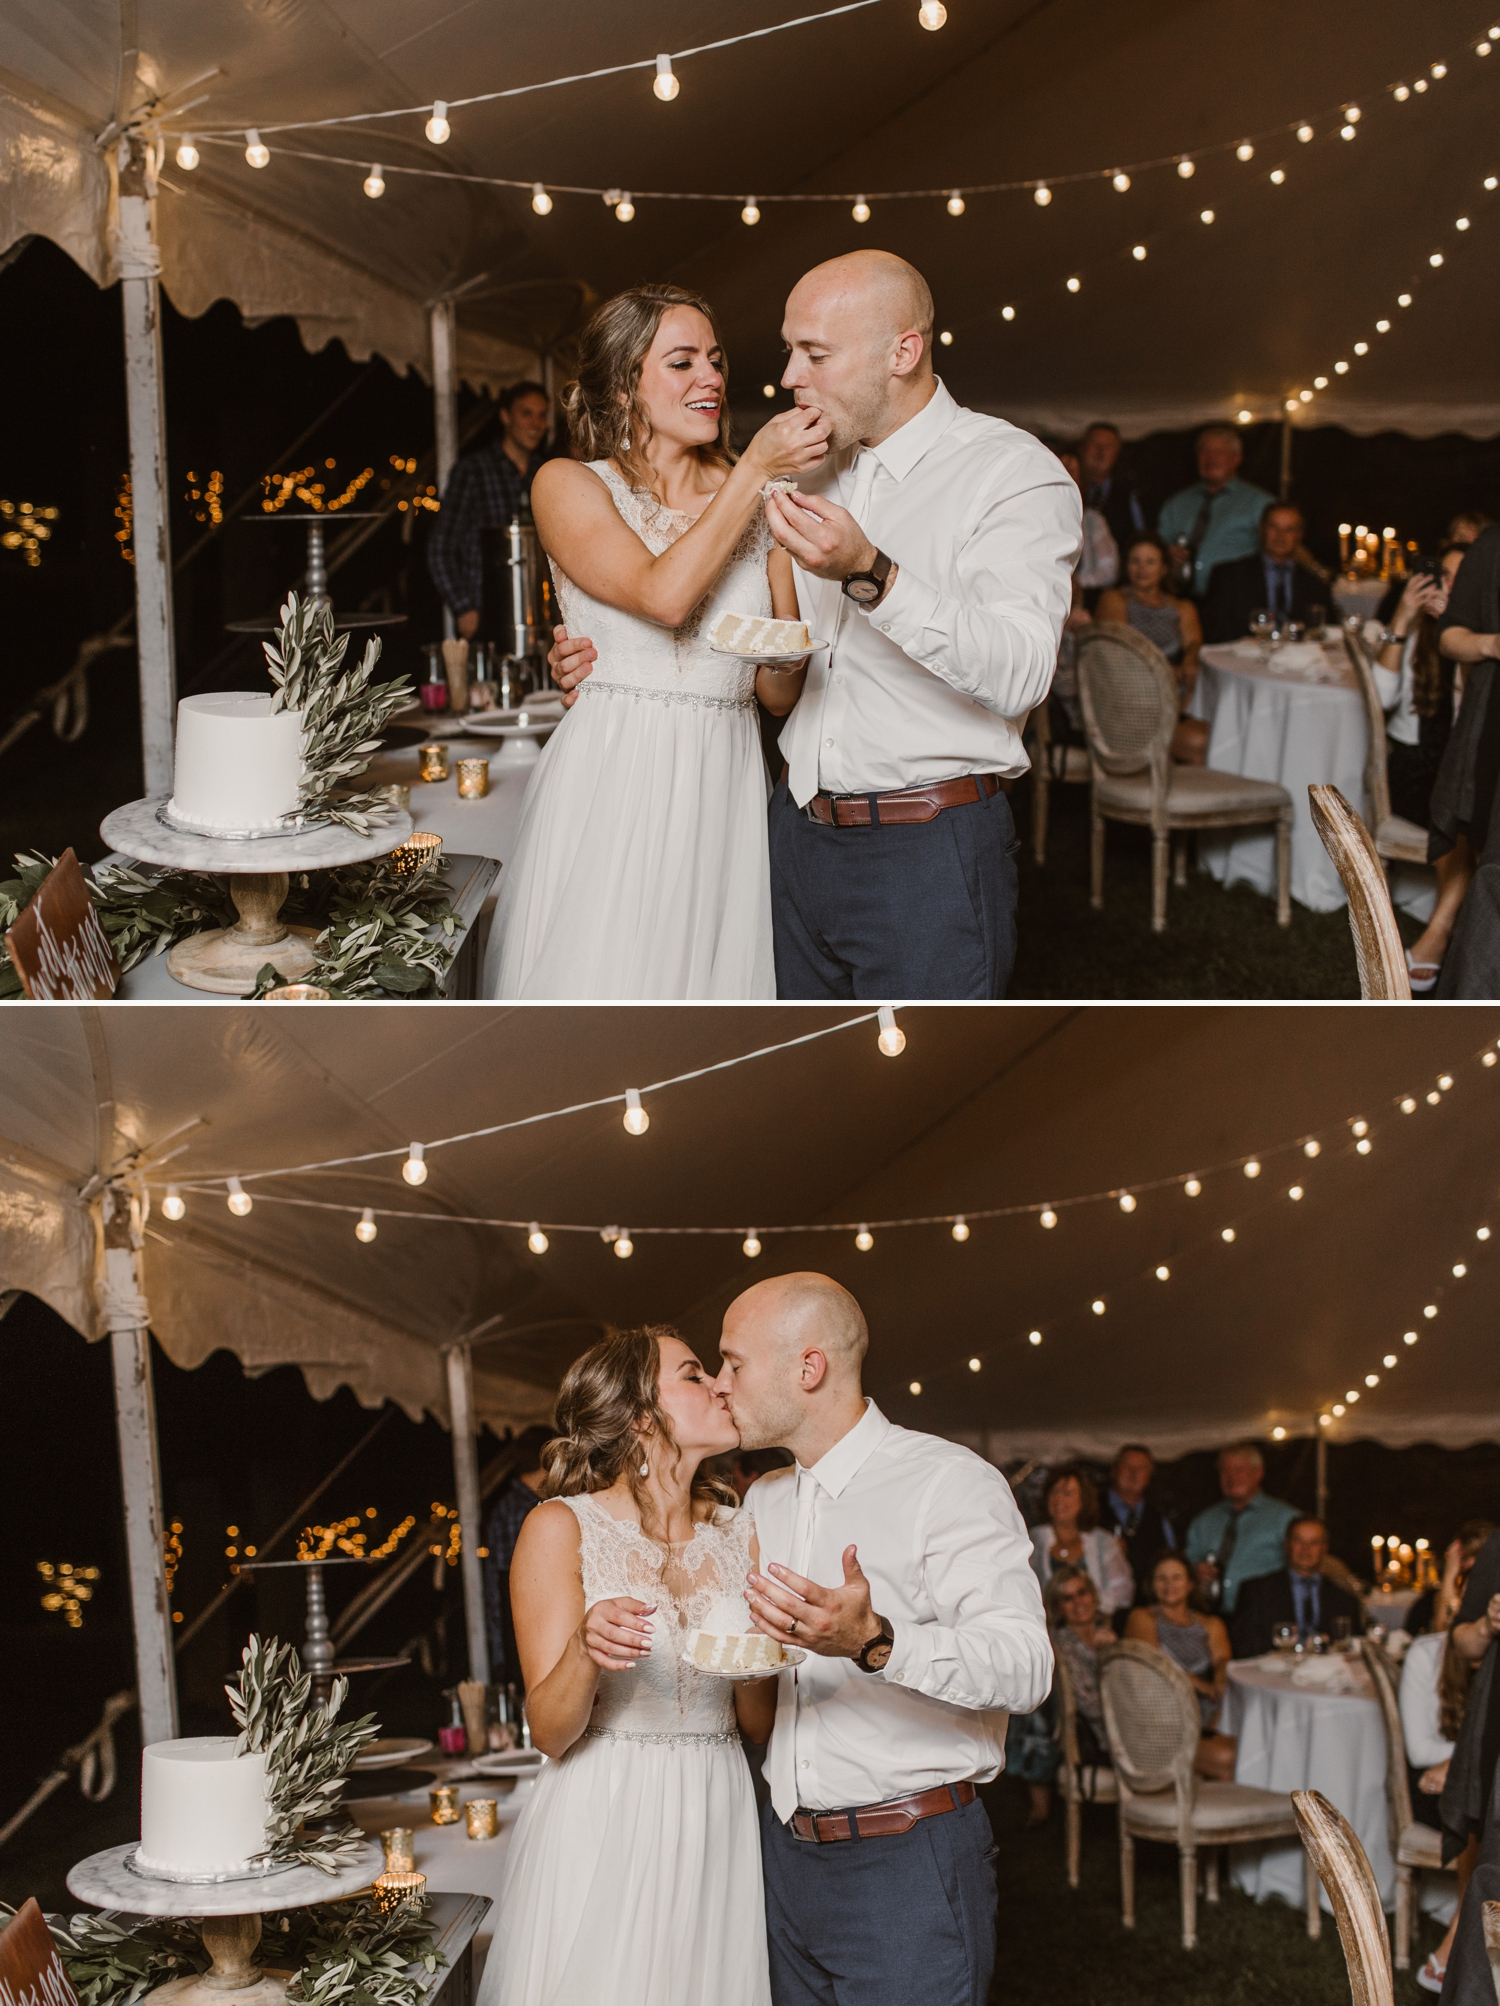 ashley-and-wills-wedding-942_baltimore-maryland-wedding-photographer-forest-earthy-annapolis-washington-d-c-photo